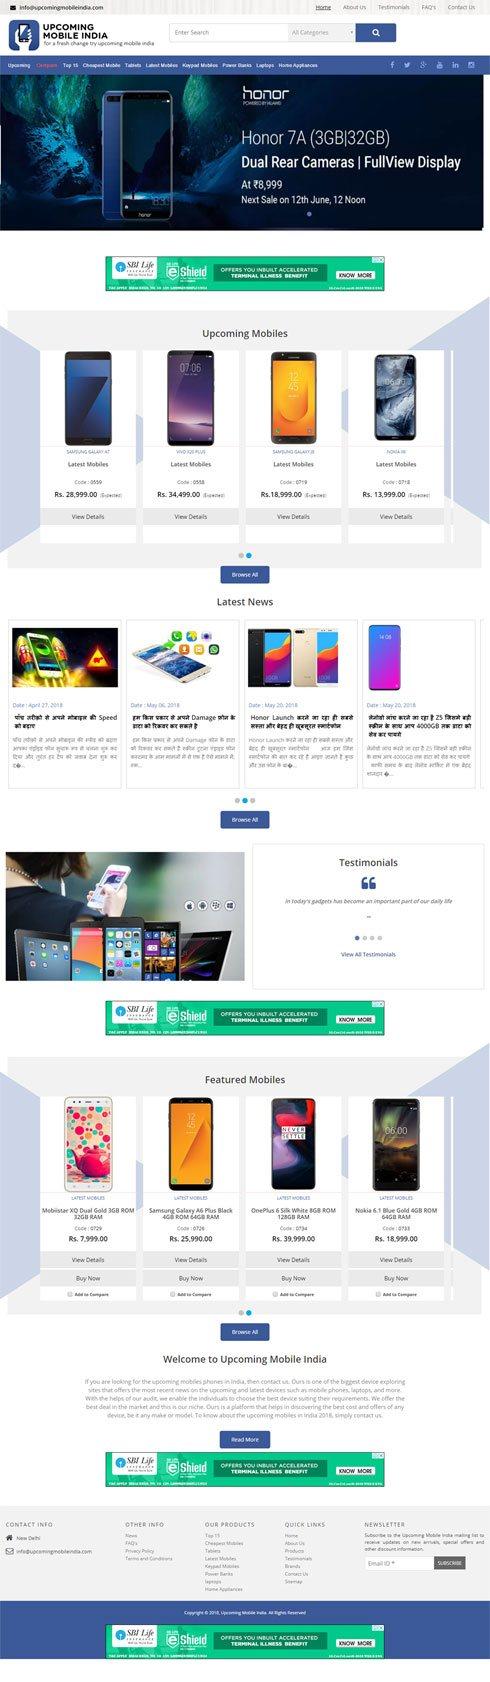 Upcoming Mobile India India Web Design